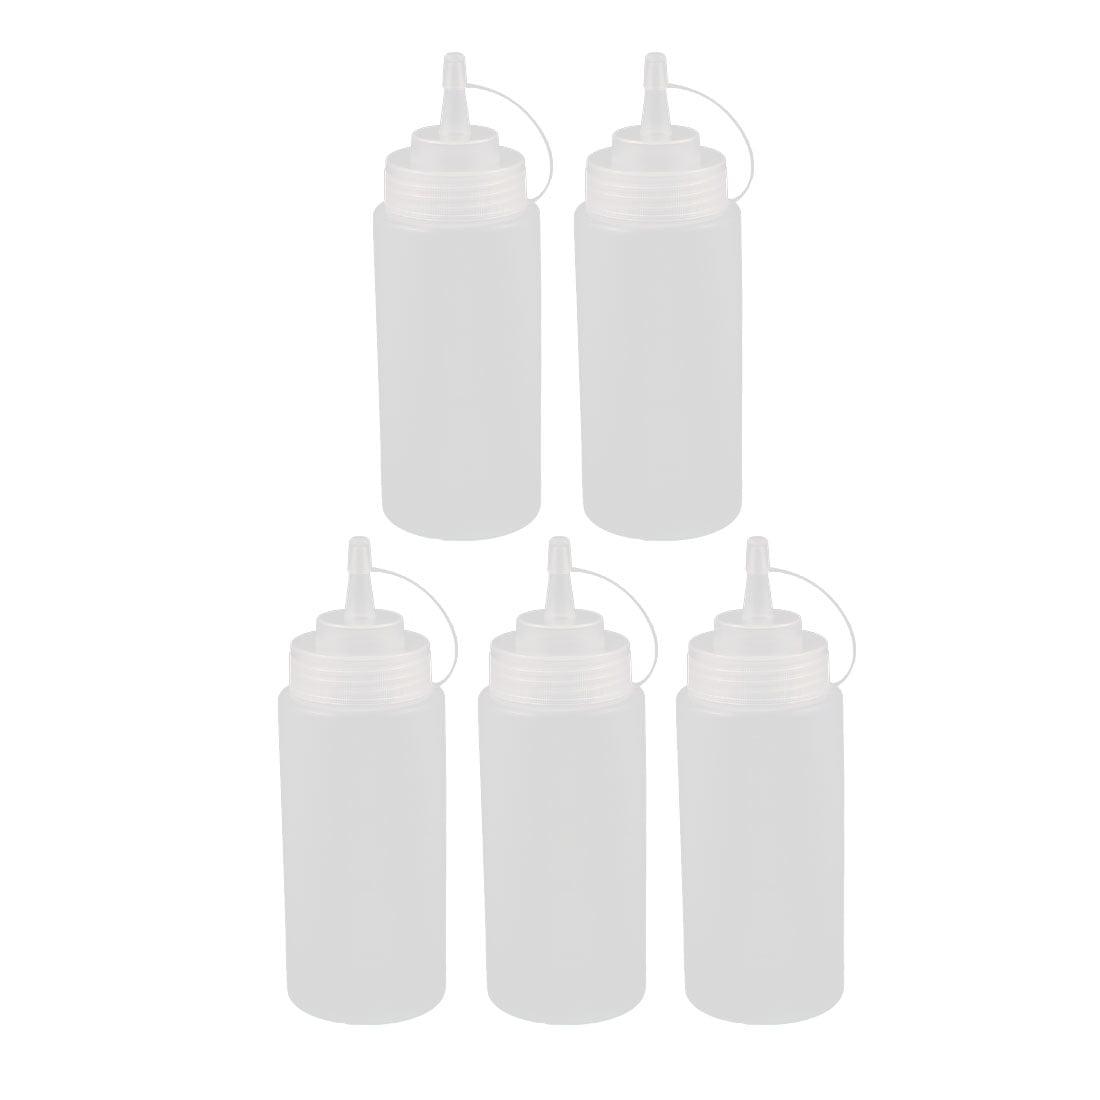 5Pcs 400ml 16oz Kitchen Food Squeeze Bottles Condiment Ketchup Mustard Oil Clear by Unique-Bargains